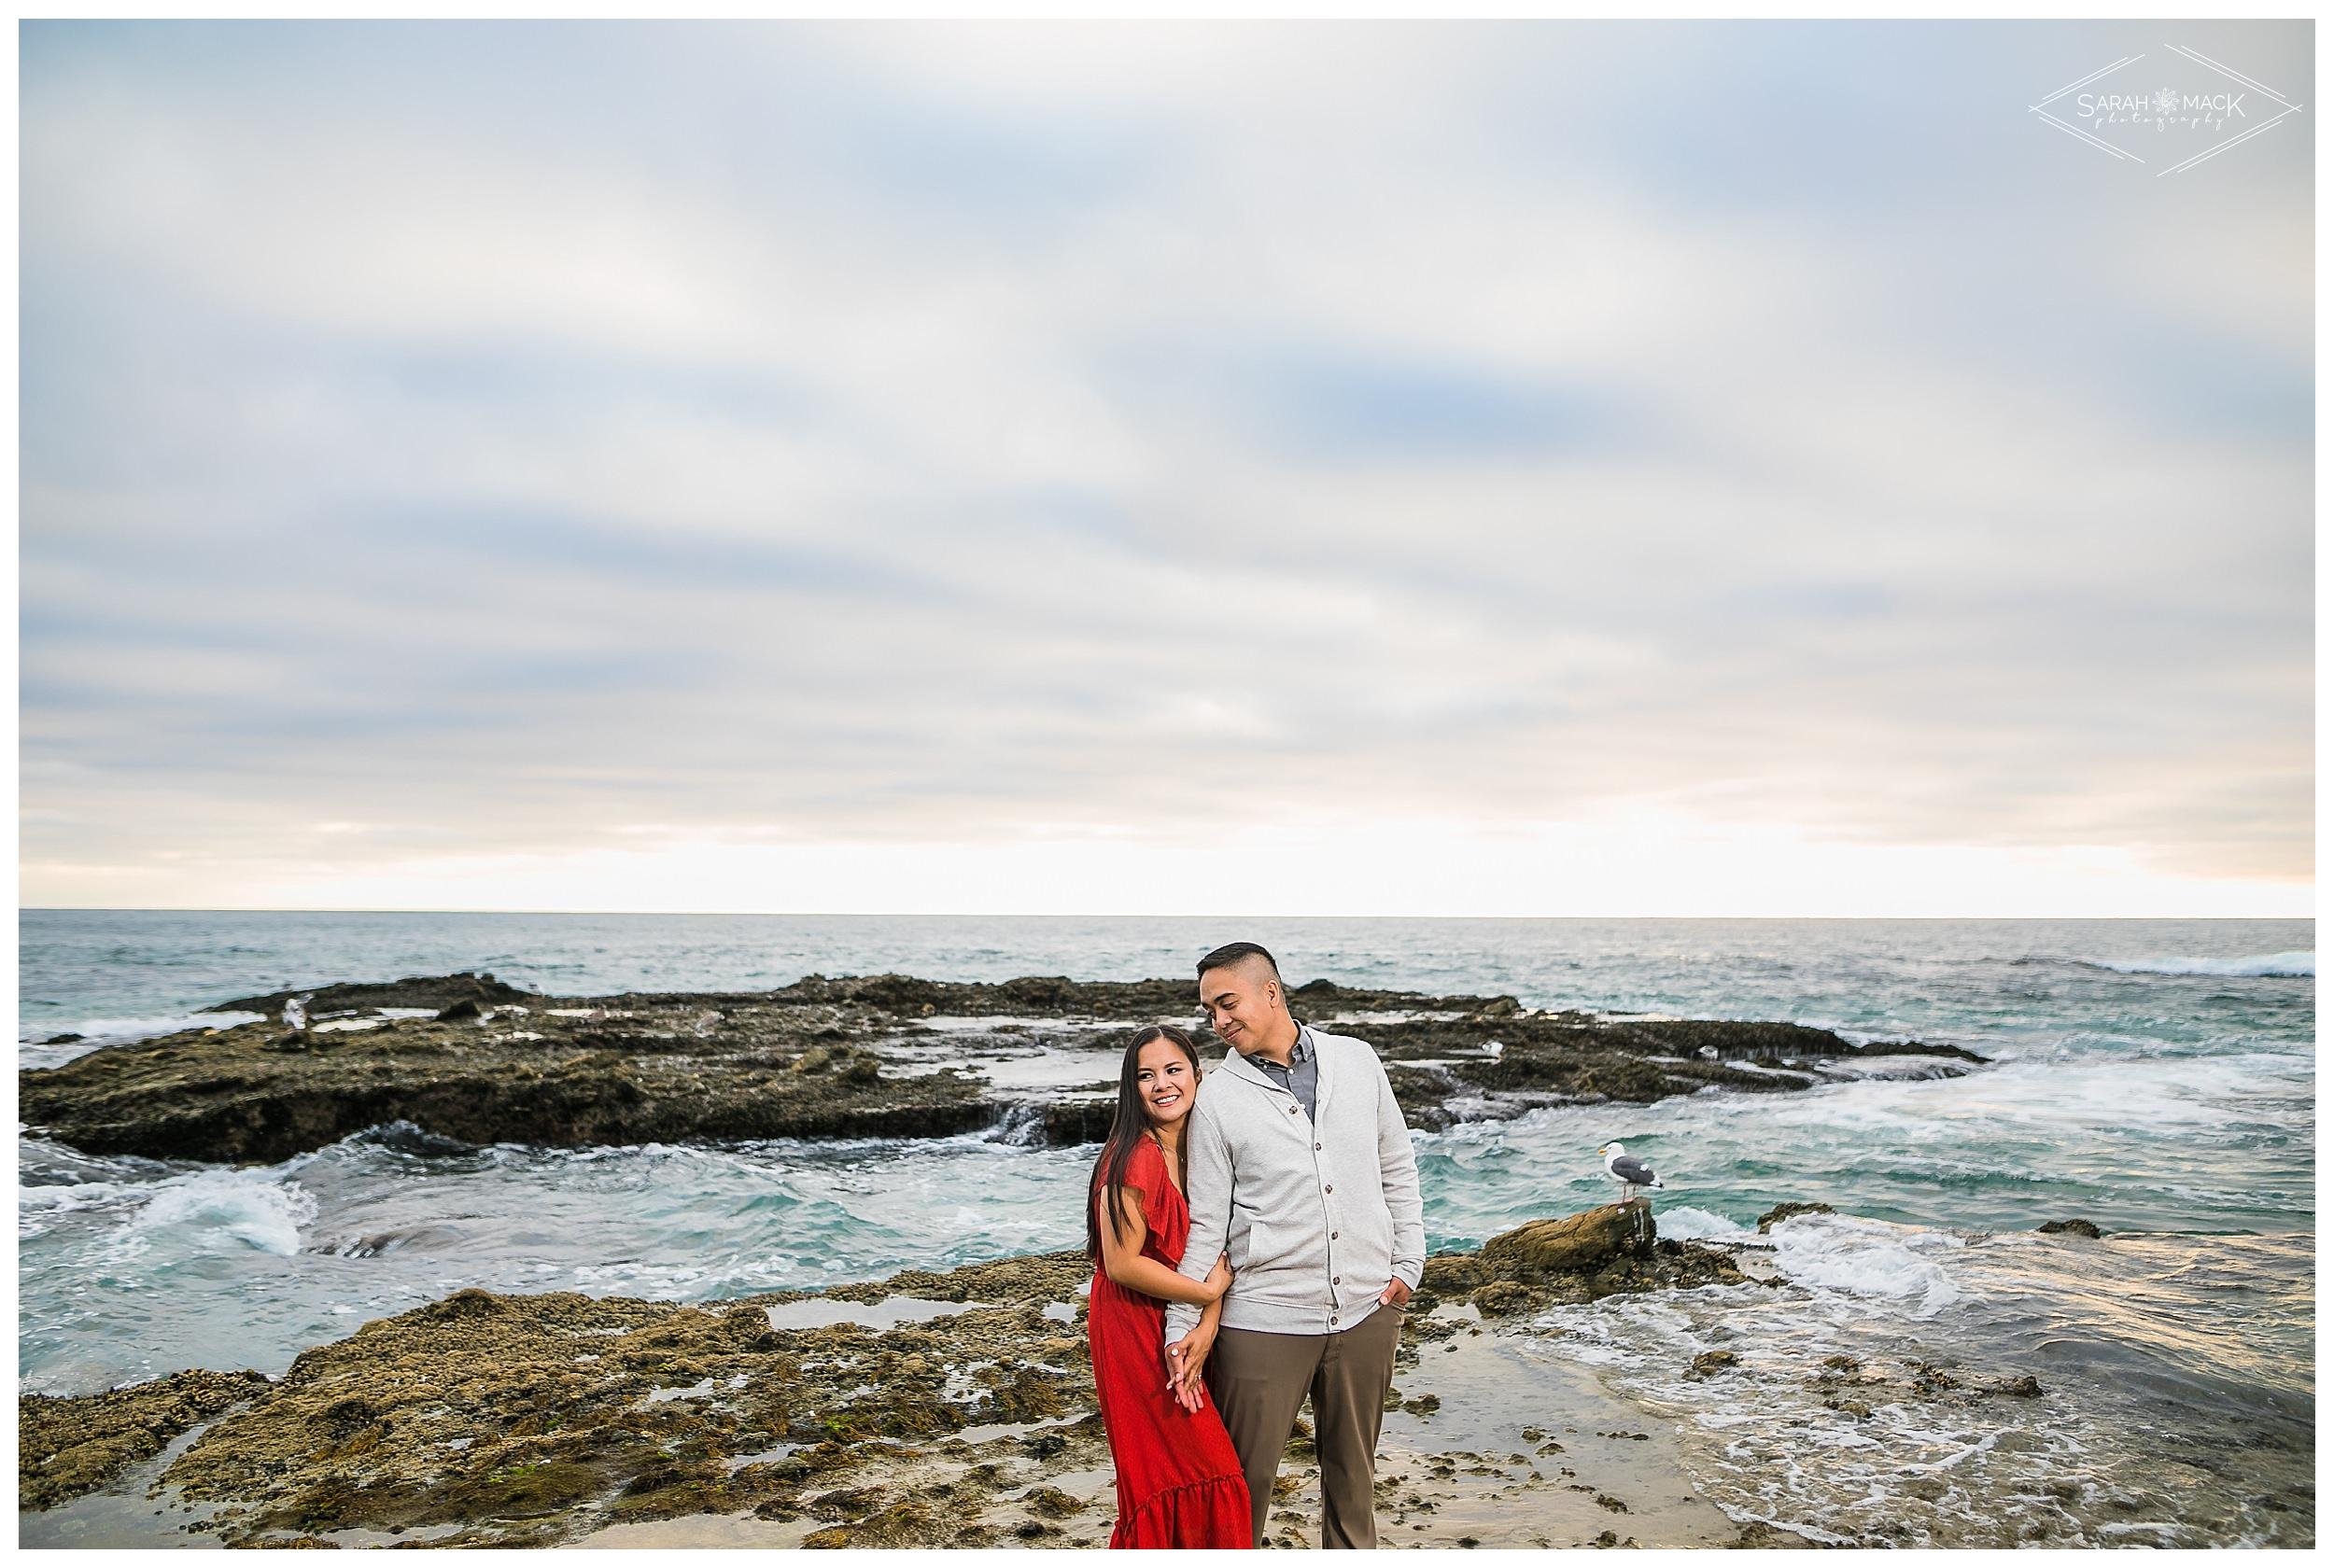 LE_Orange-County-Engagement-Photography 81.jpg